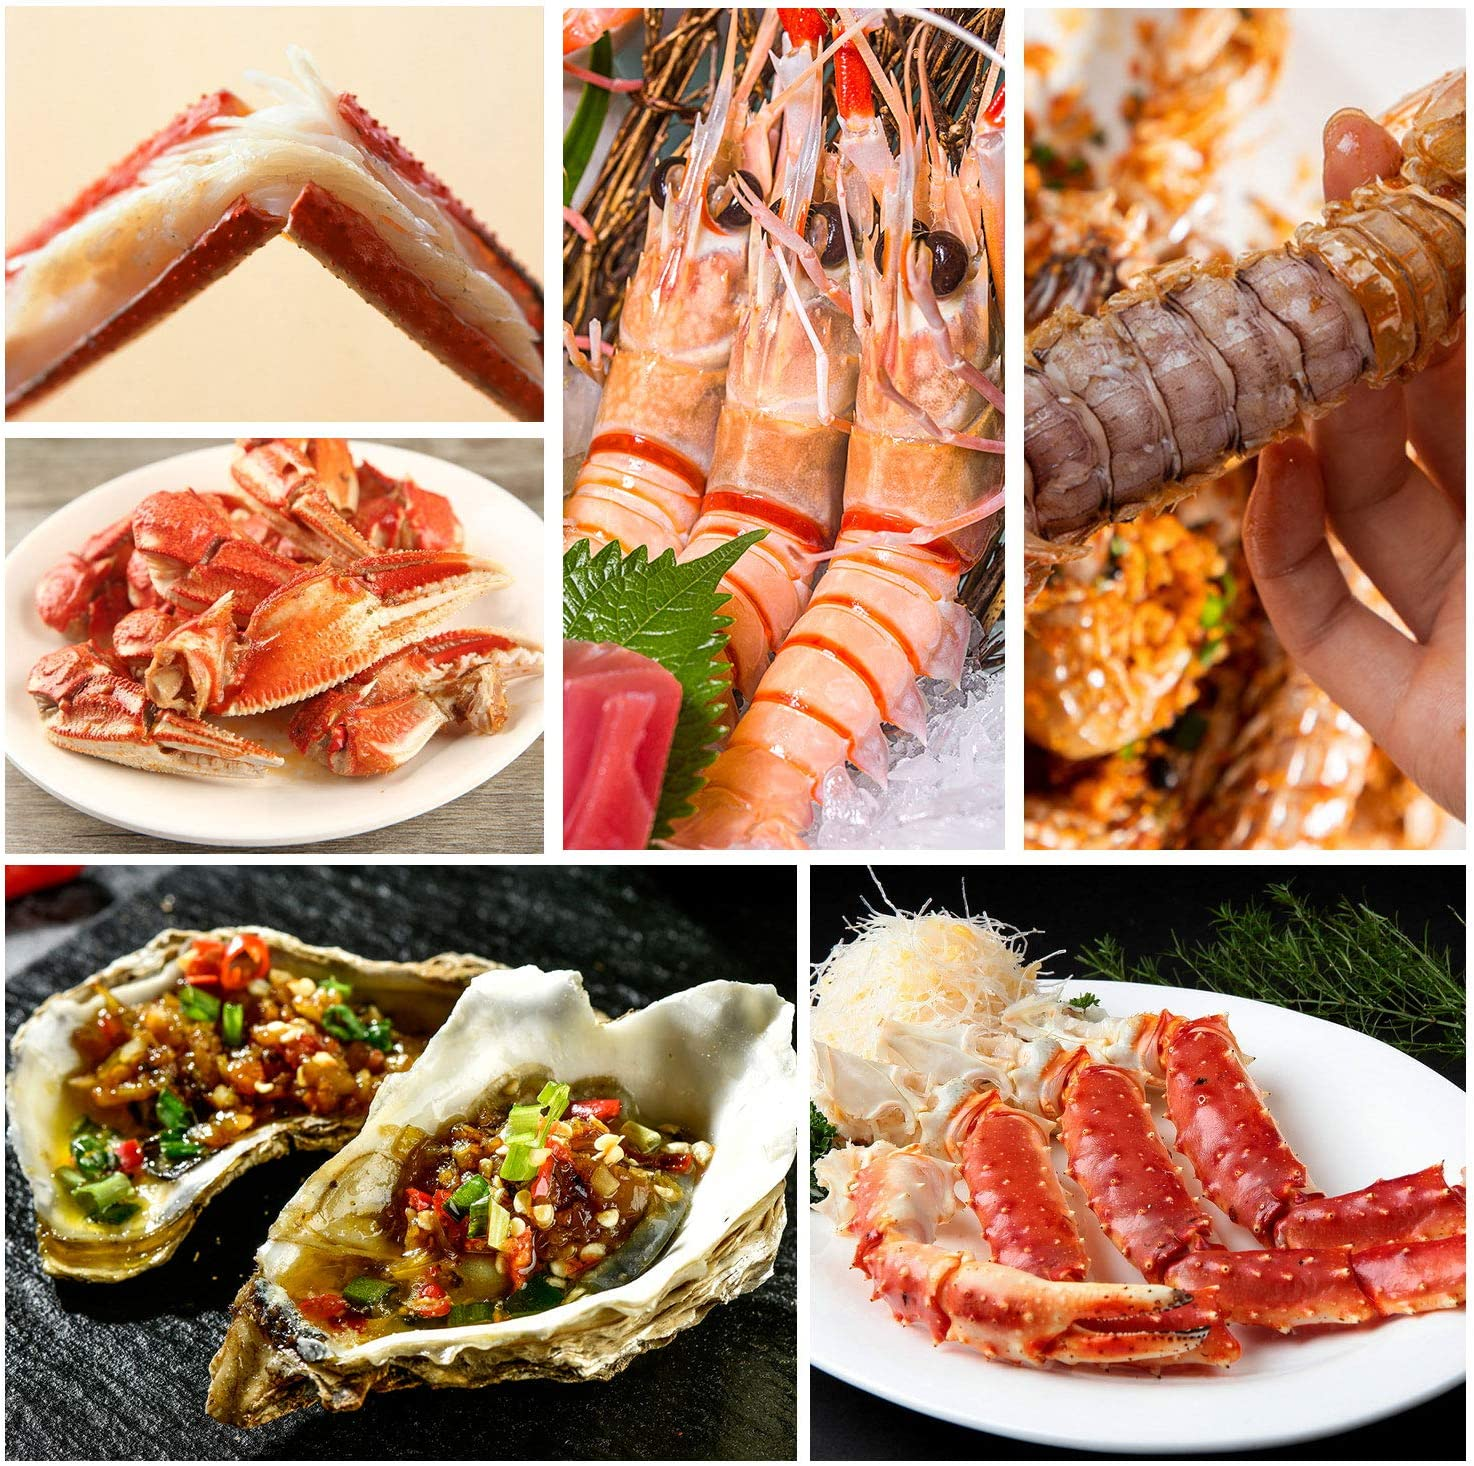 2 Crab Crackers 2 Stainless Steel Forks 1 Storage Bag 2 Seafood Scissors 9Pcs Seafood Tools Set Shellfish Lobster Crab Leg Sheller Nut Crackers Opener 2 Lobster Shell Knife